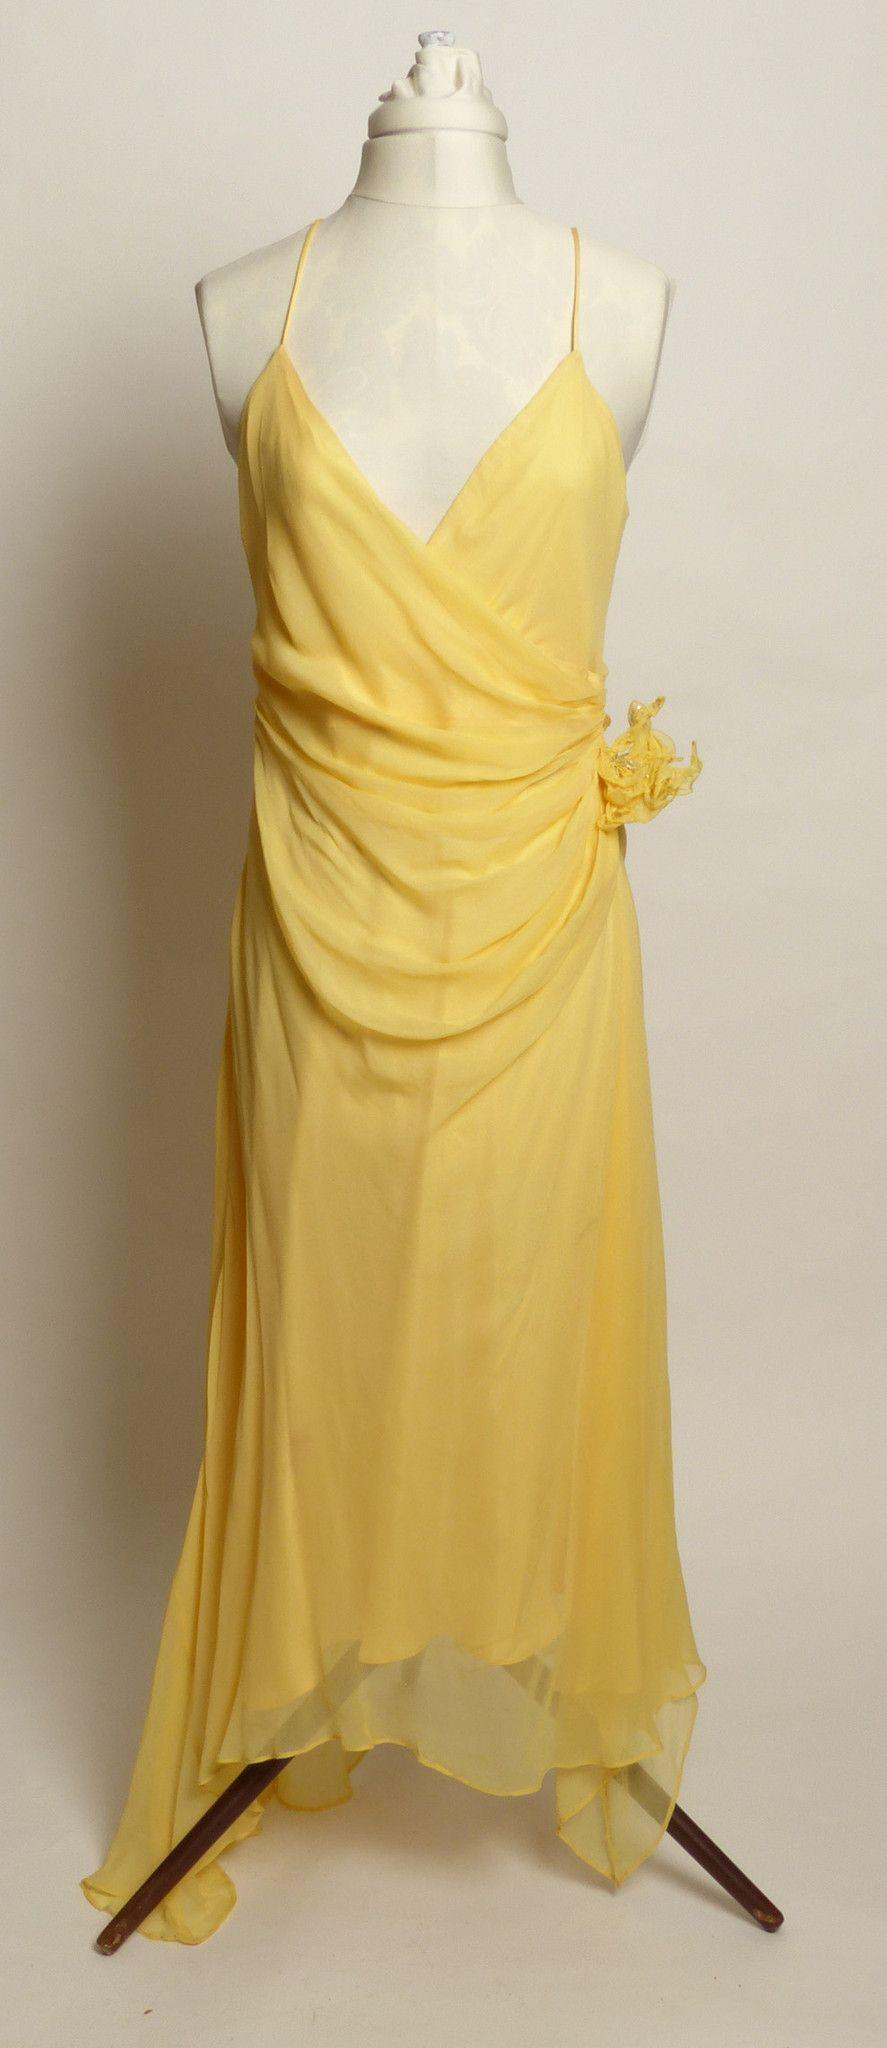 Circa ss shelli segal yellow silk dress shelli segal silk